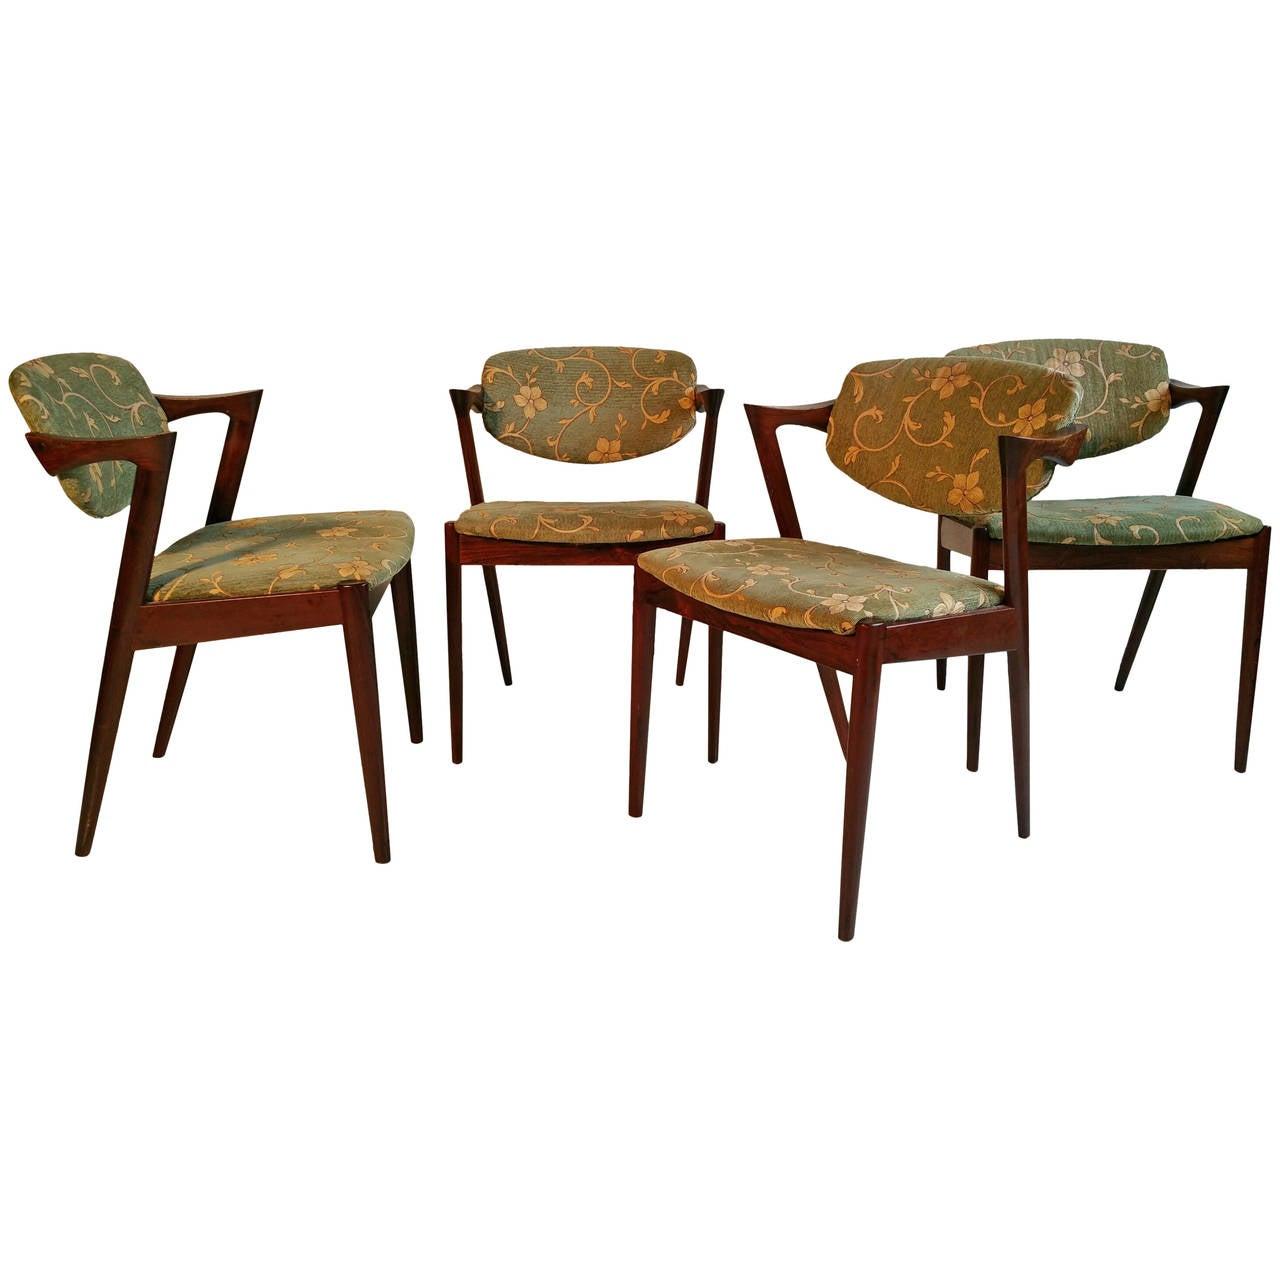 Chair 42 by kai kristiansen set of four in rosewood at 1stdibs - Kai kristiansen chair ...